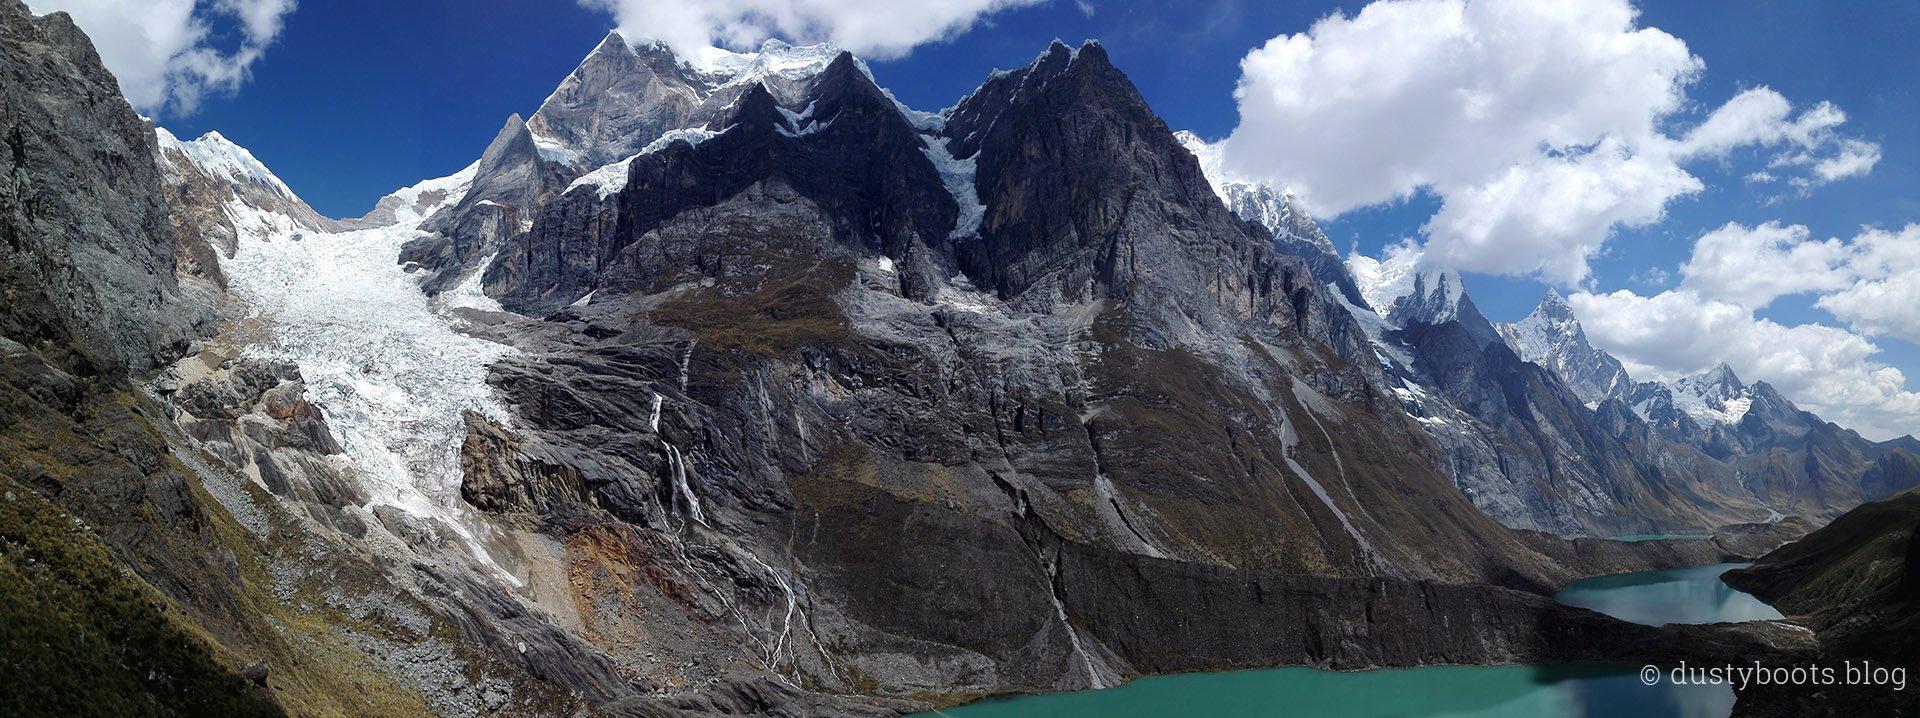 Tag 4: Das 3-Lagunen-Panorama mit Gangrajancacocha, Siulacocha und Quesillococha